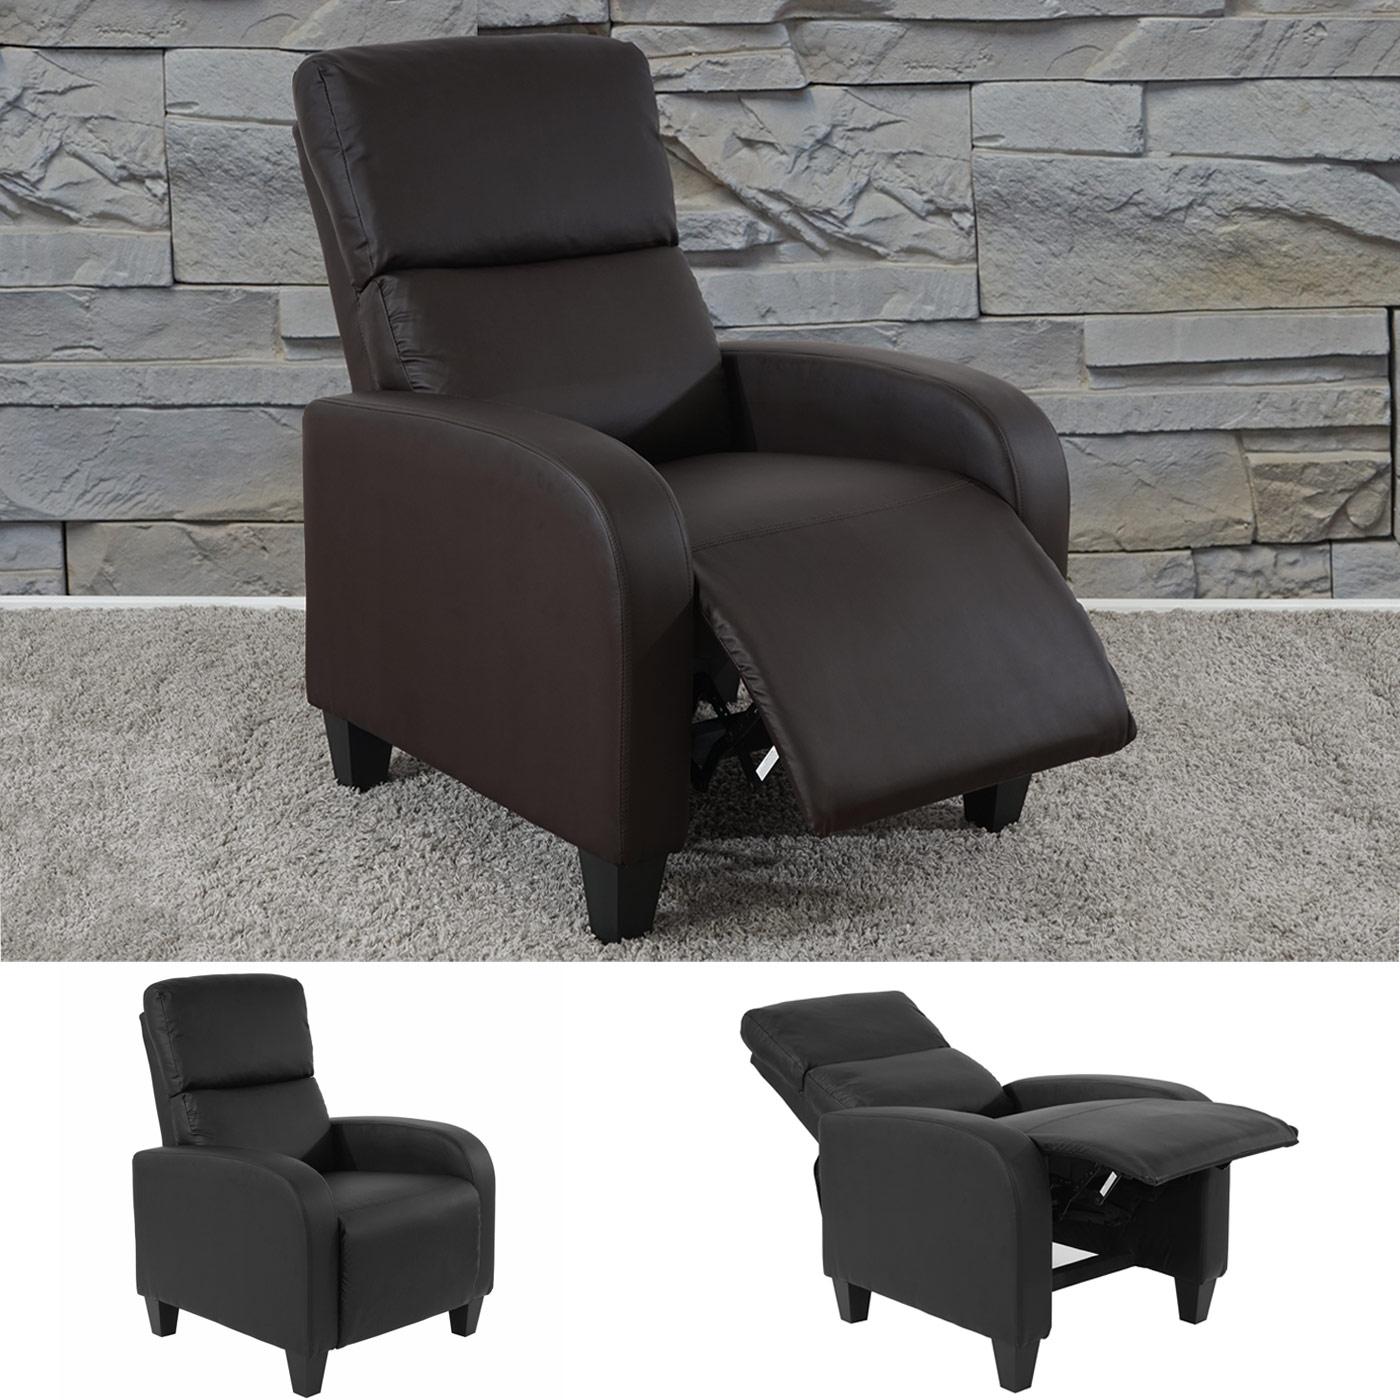 fernsehsessel worcester relaxsessel liege sessel. Black Bedroom Furniture Sets. Home Design Ideas